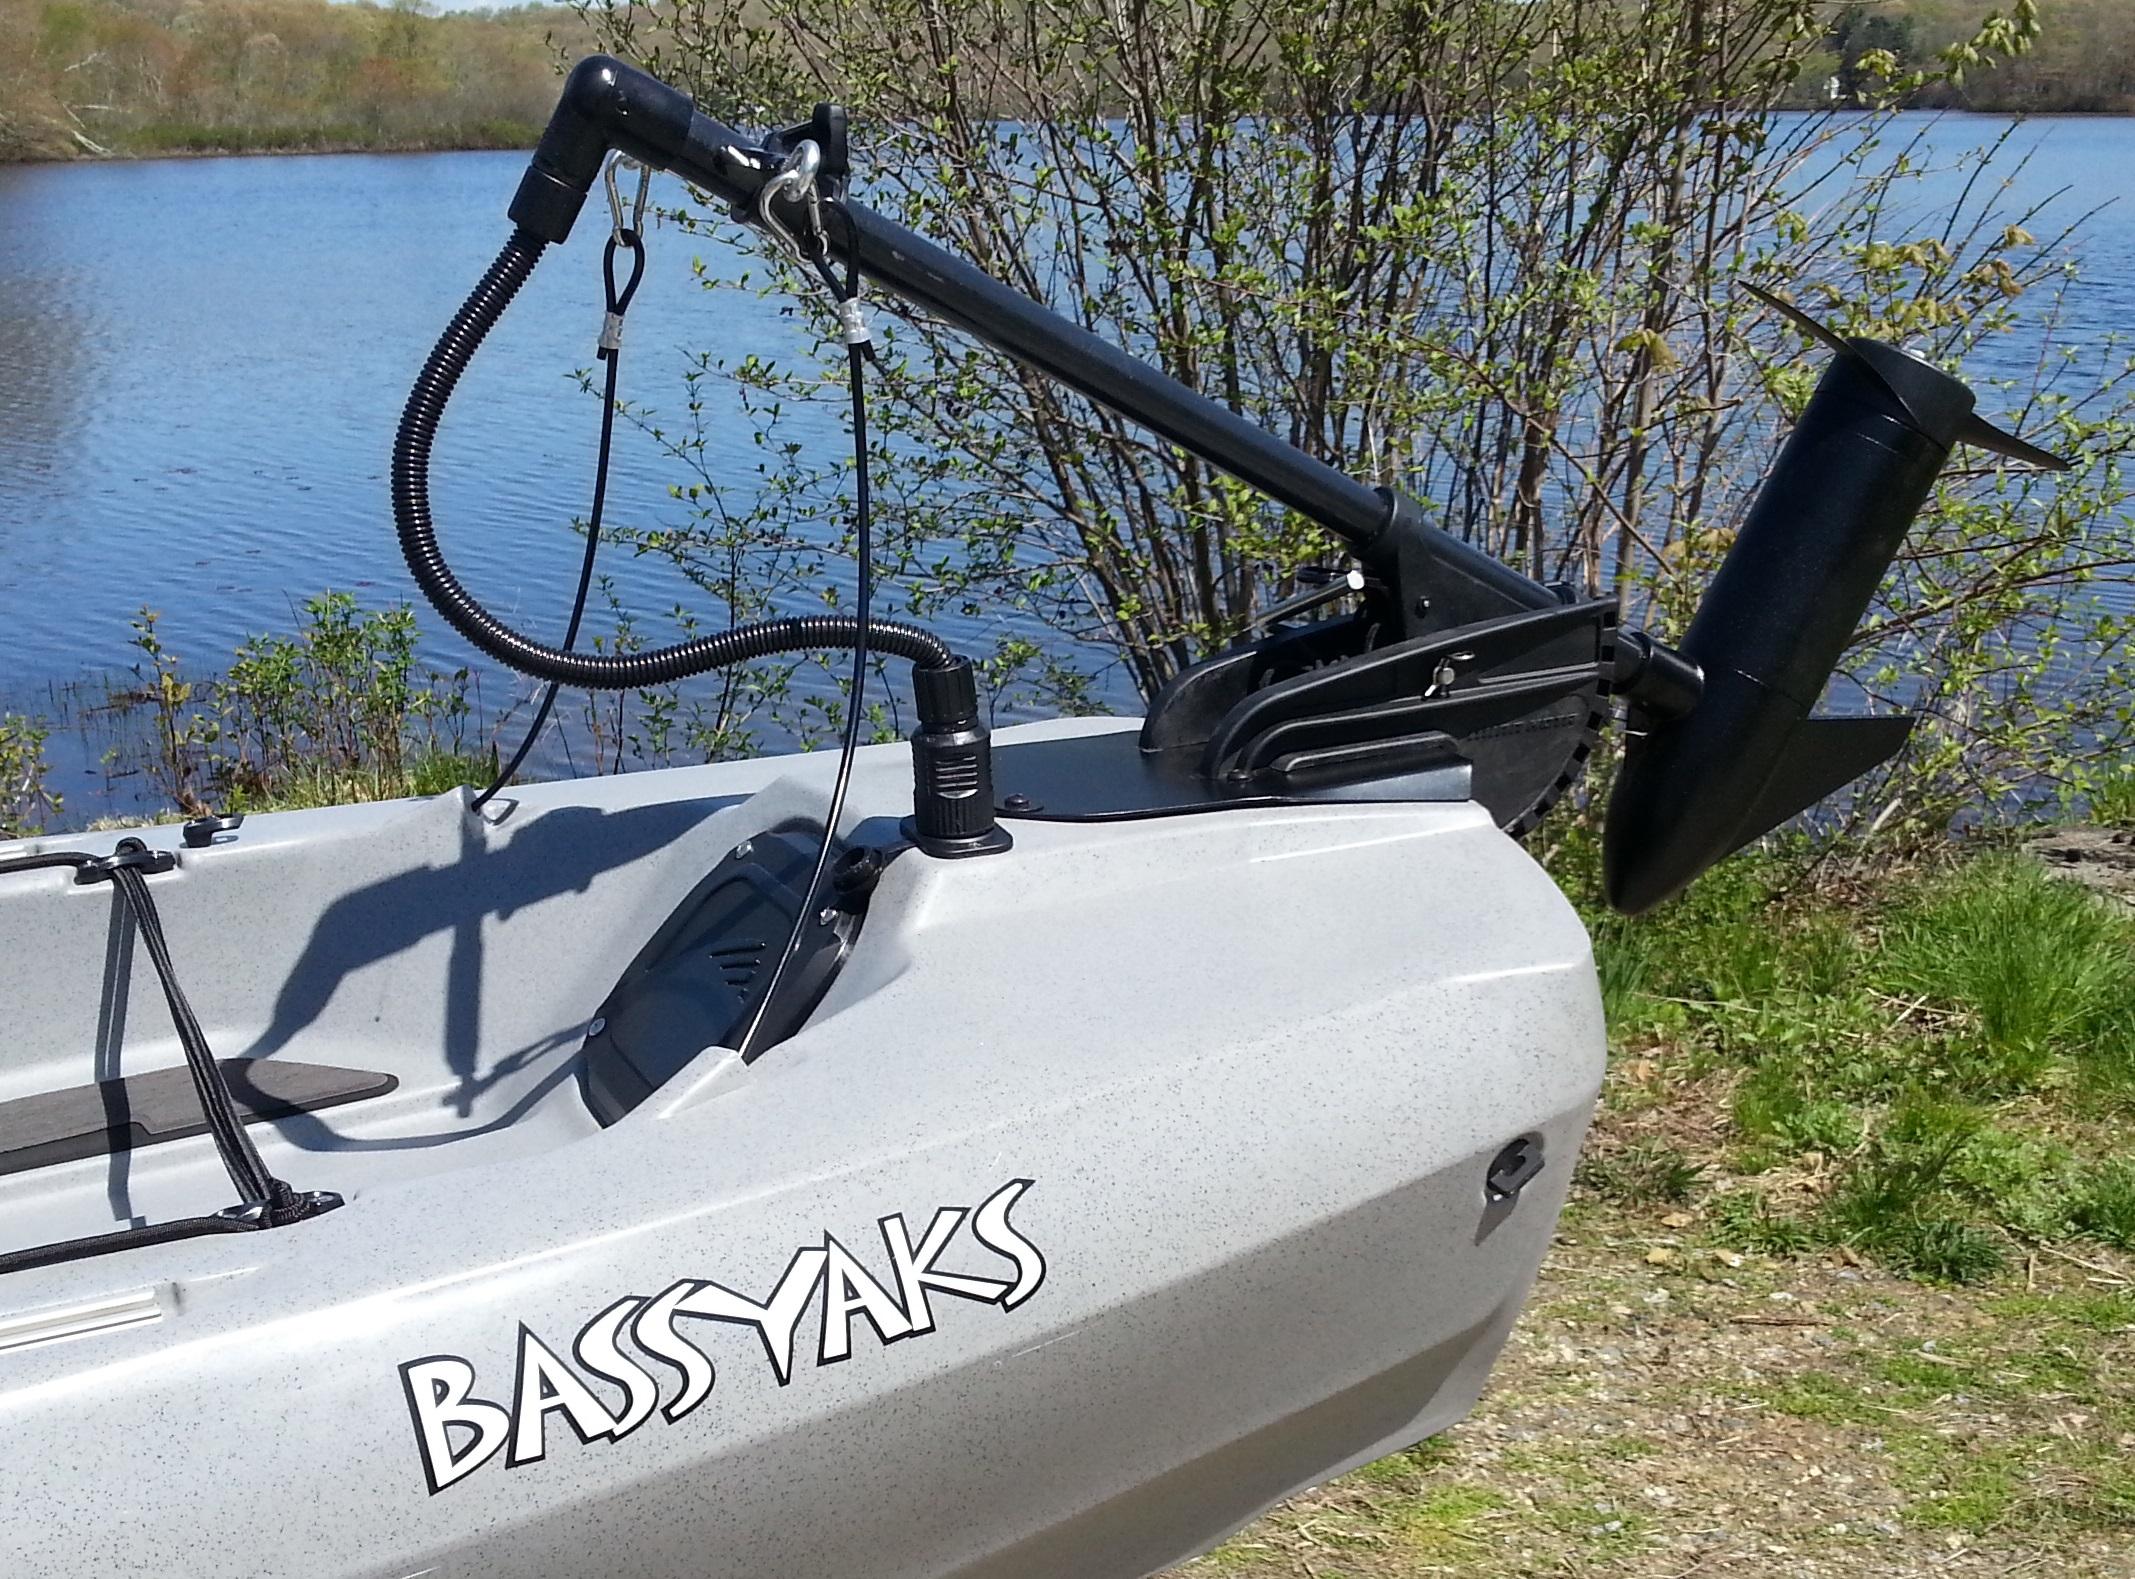 Motors & Pedal Drives: Bassyaks Electric Motor System by Bassyaks - Image 4110